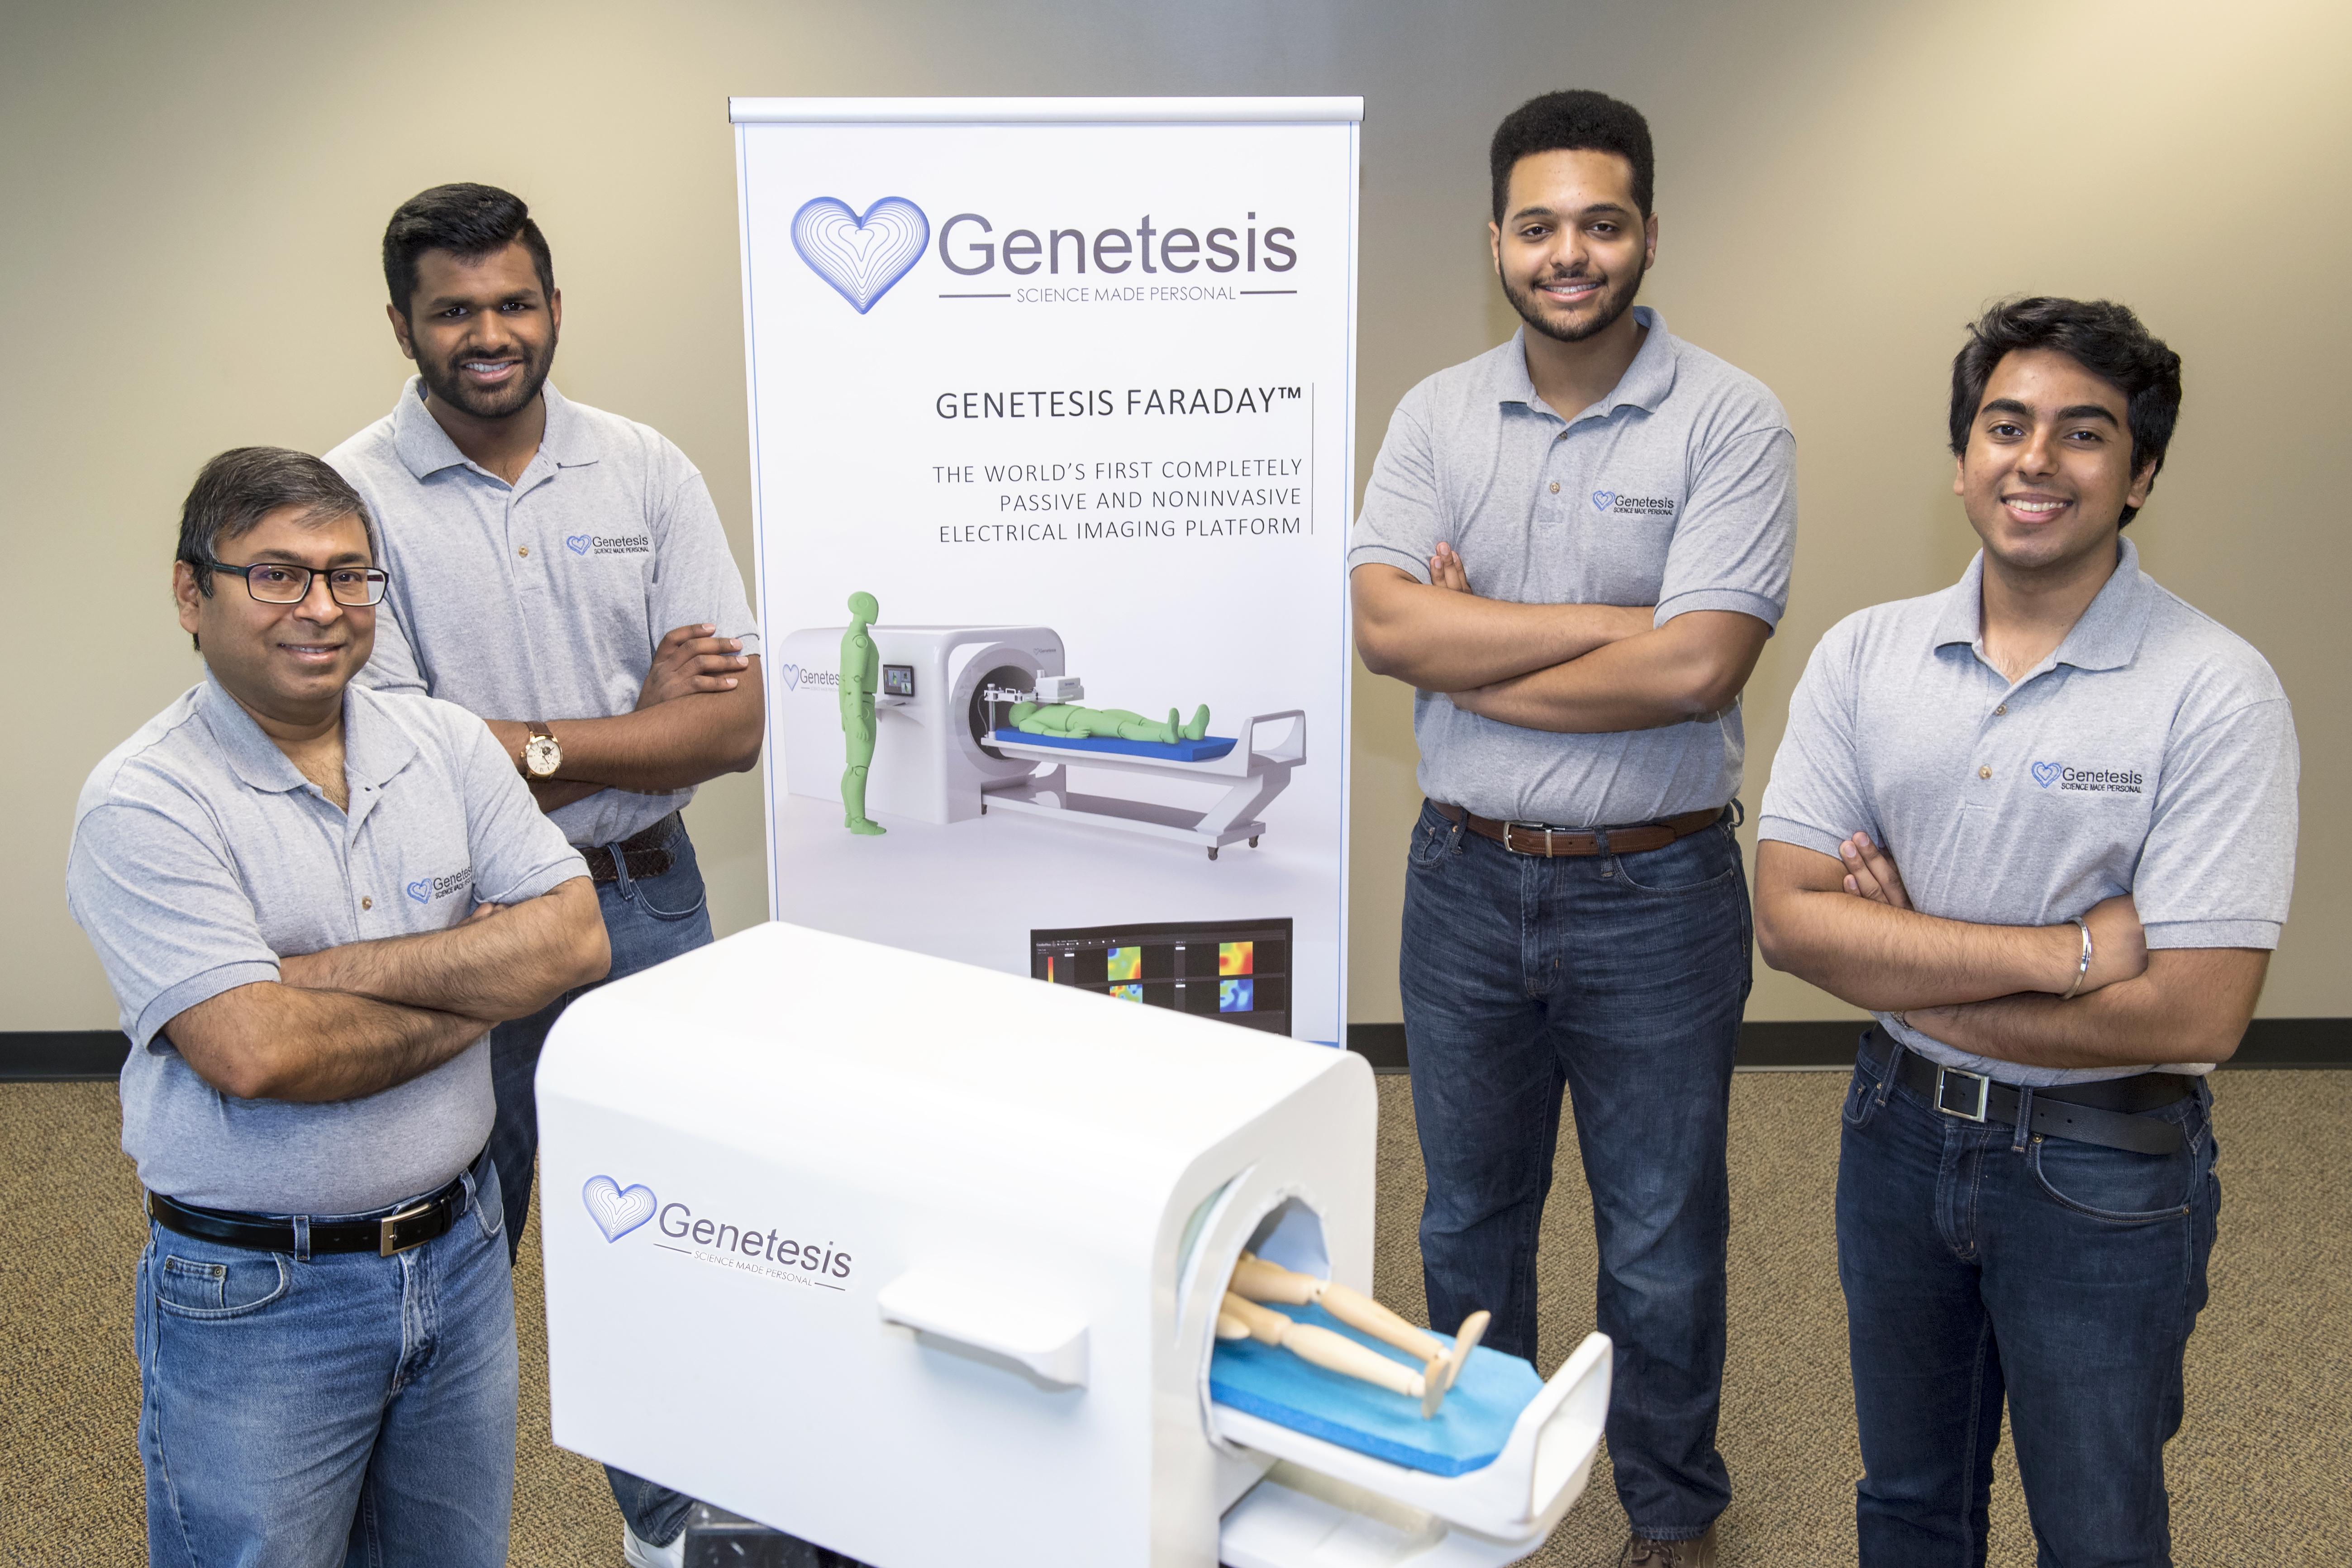 From left, leadership of Genetesis: Chandan Srivastava, CFO, Vineet Erasala, COO, Manny Setegn, CTO, and Peeyush Shrivastava, CEO, show a small scale prototype of the CardioFlux imaging system. (Photo: Business Wire)